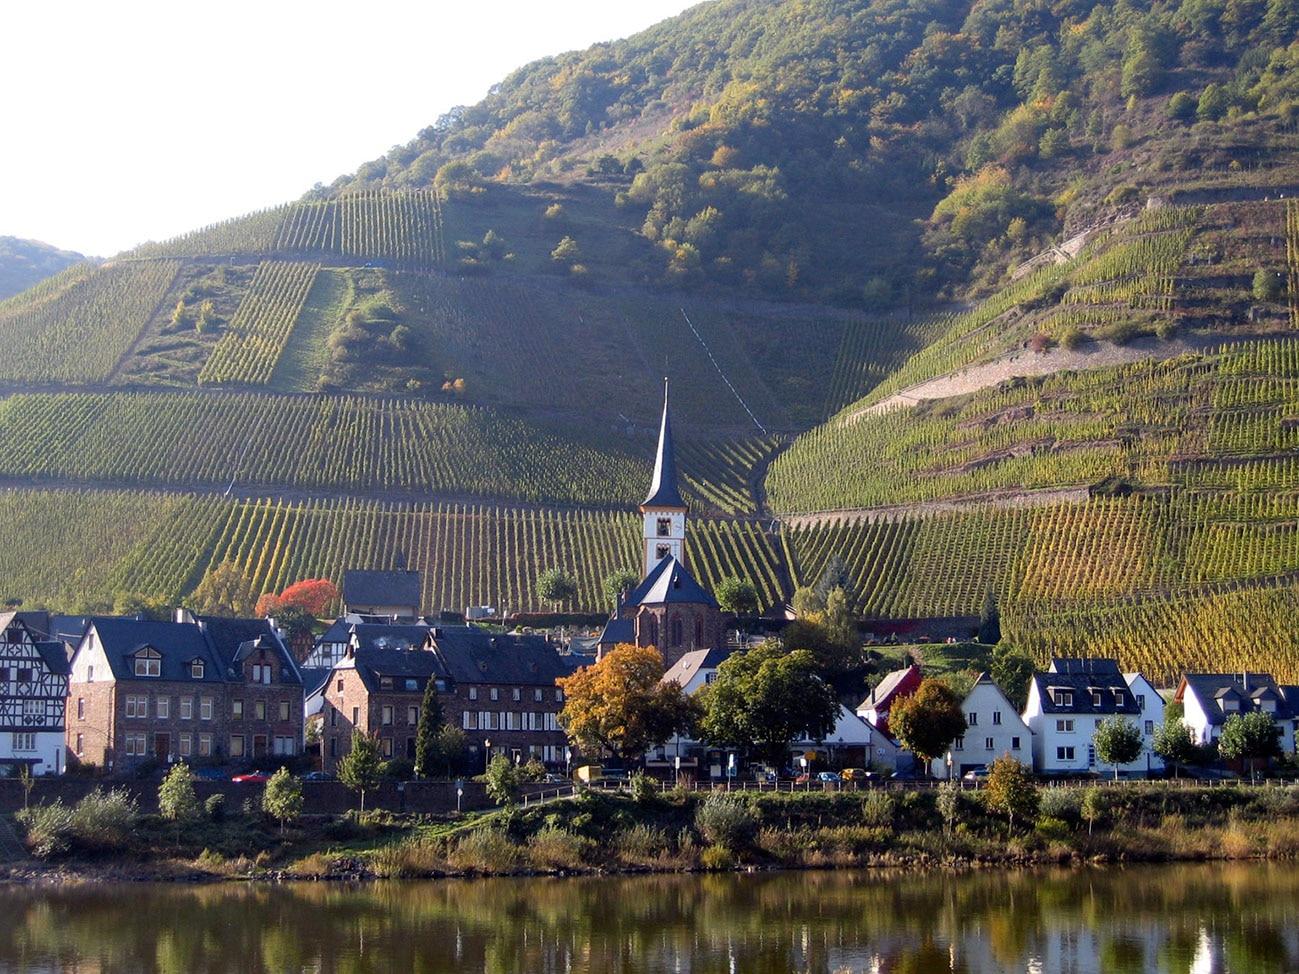 Klettersteig Pfalz : Klettersteige klettersteig auf den bremmer calmont km bergwelten